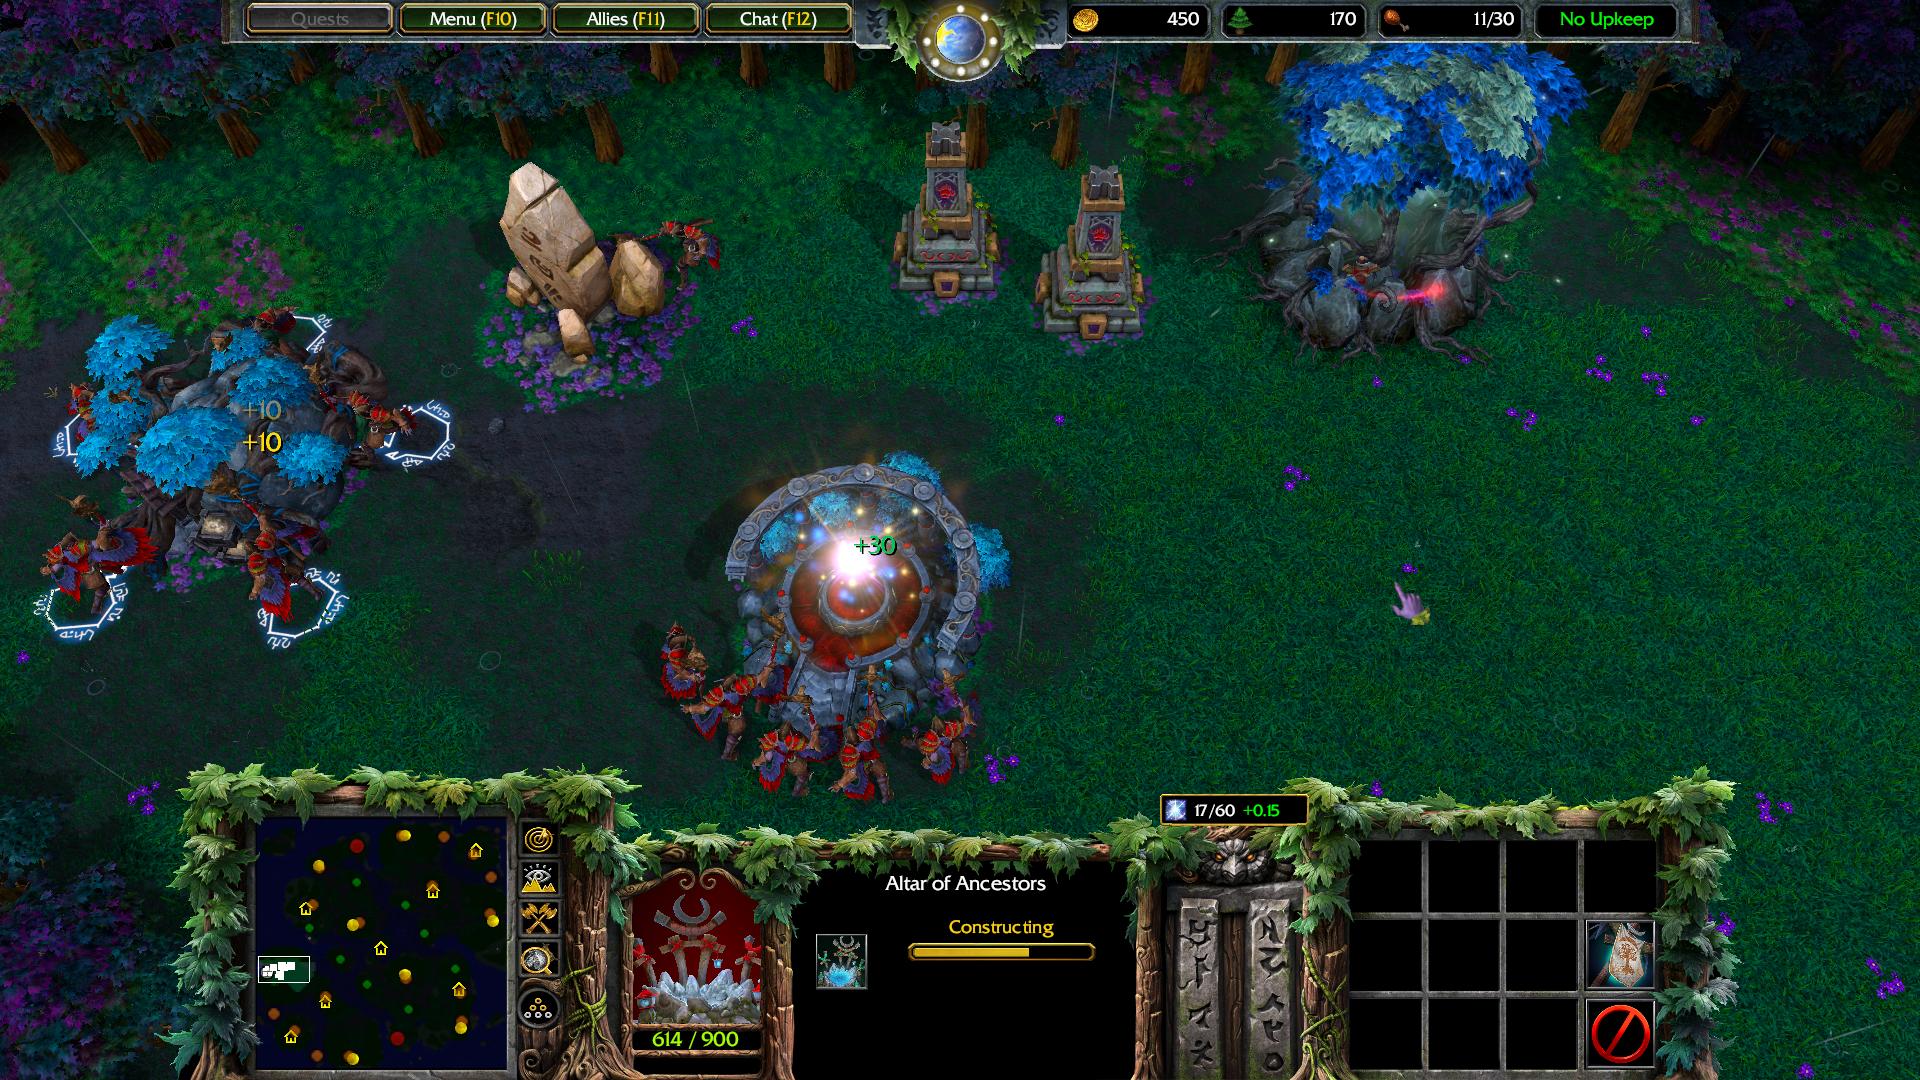 screenshot-5-png.354236